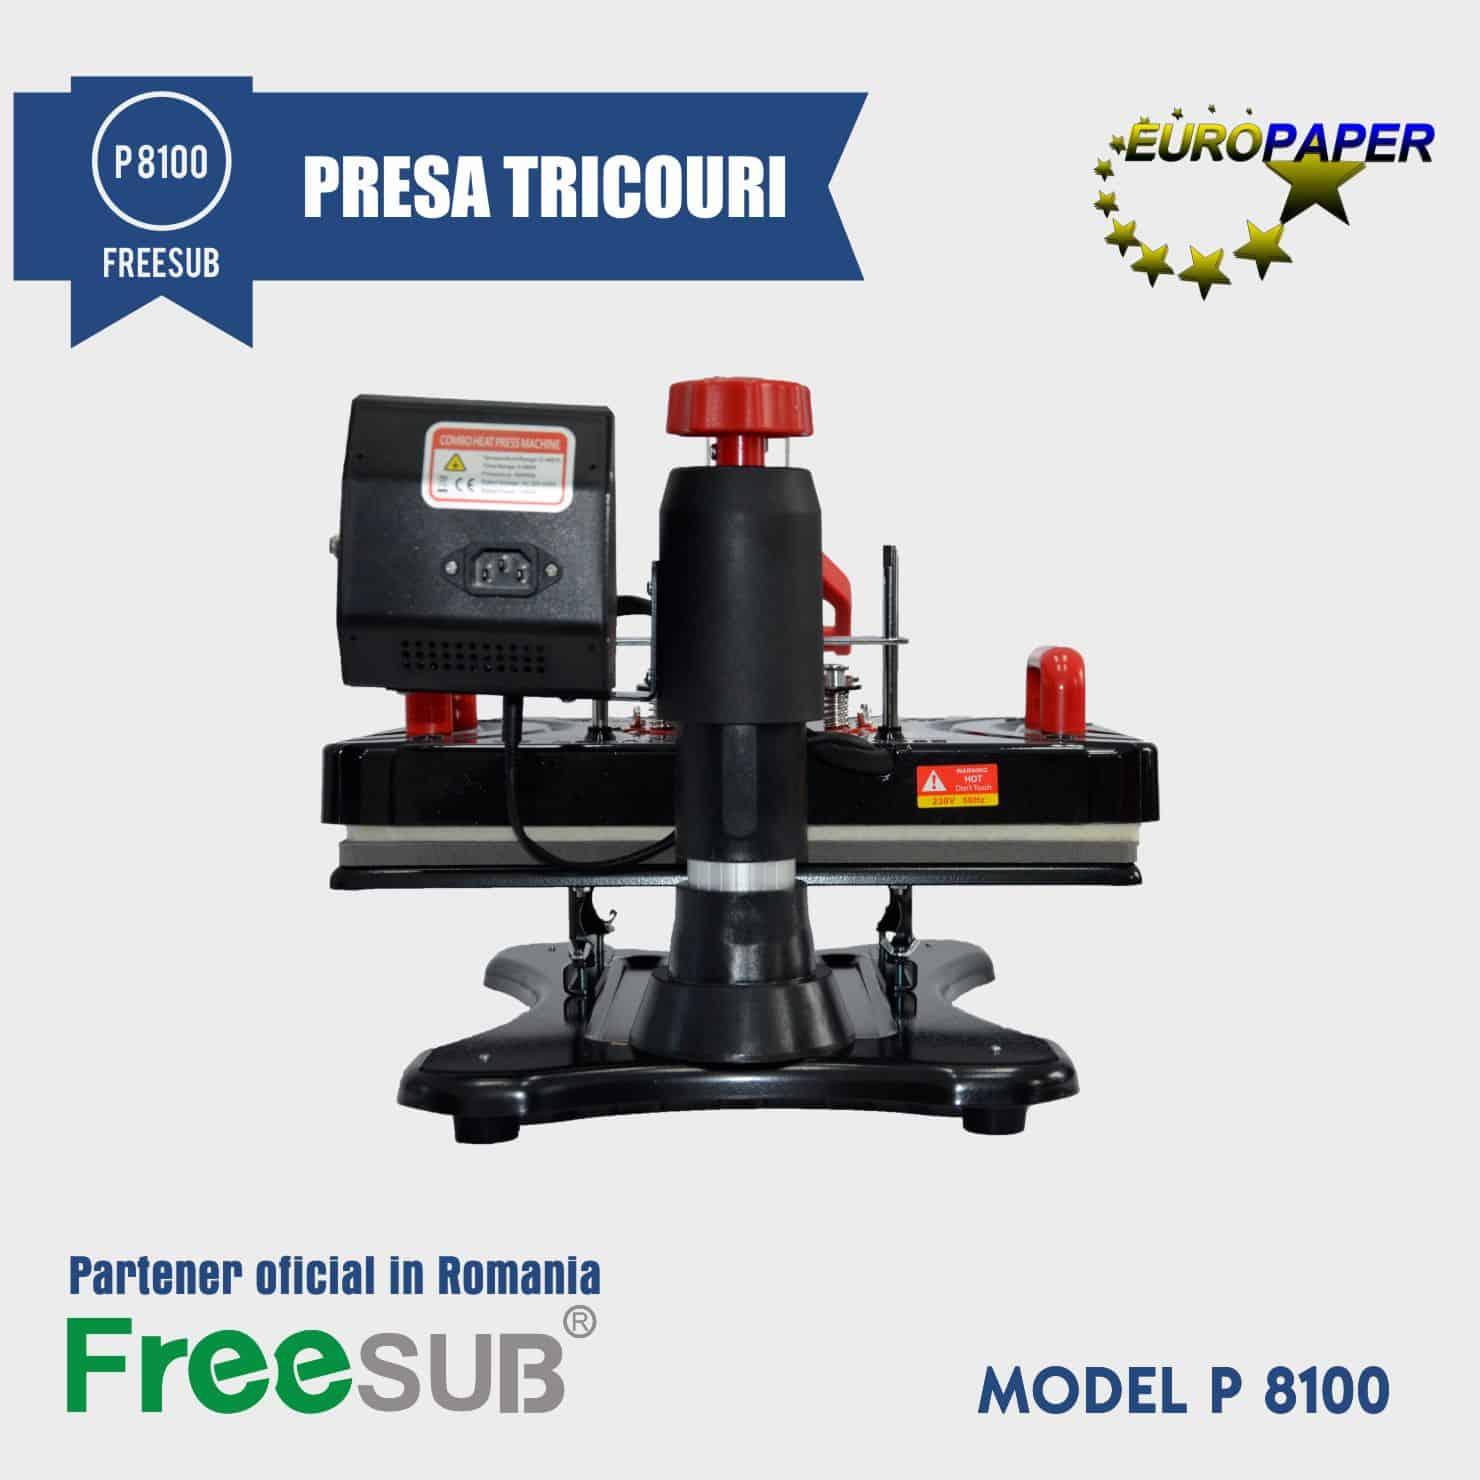 FREESUB PRESA TRICOURI